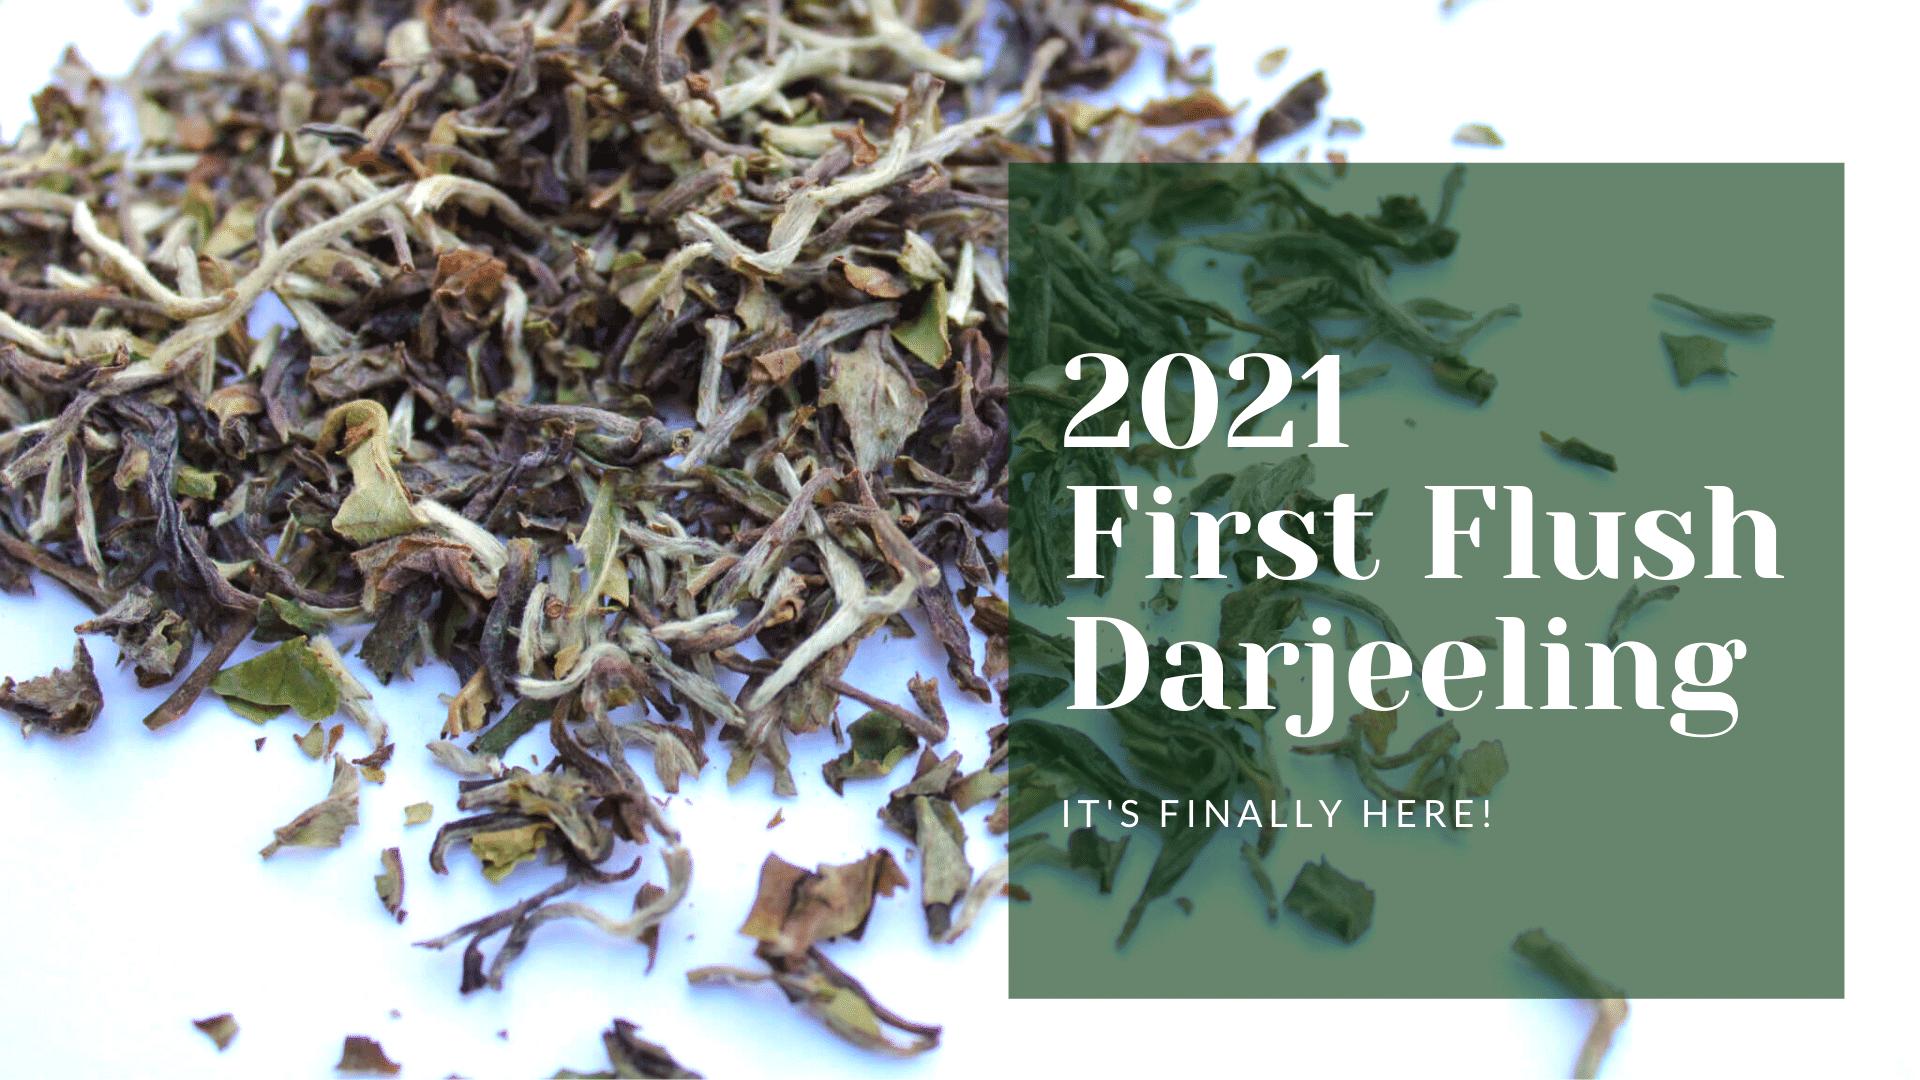 new tea web sliders-3-darjeeling compressed